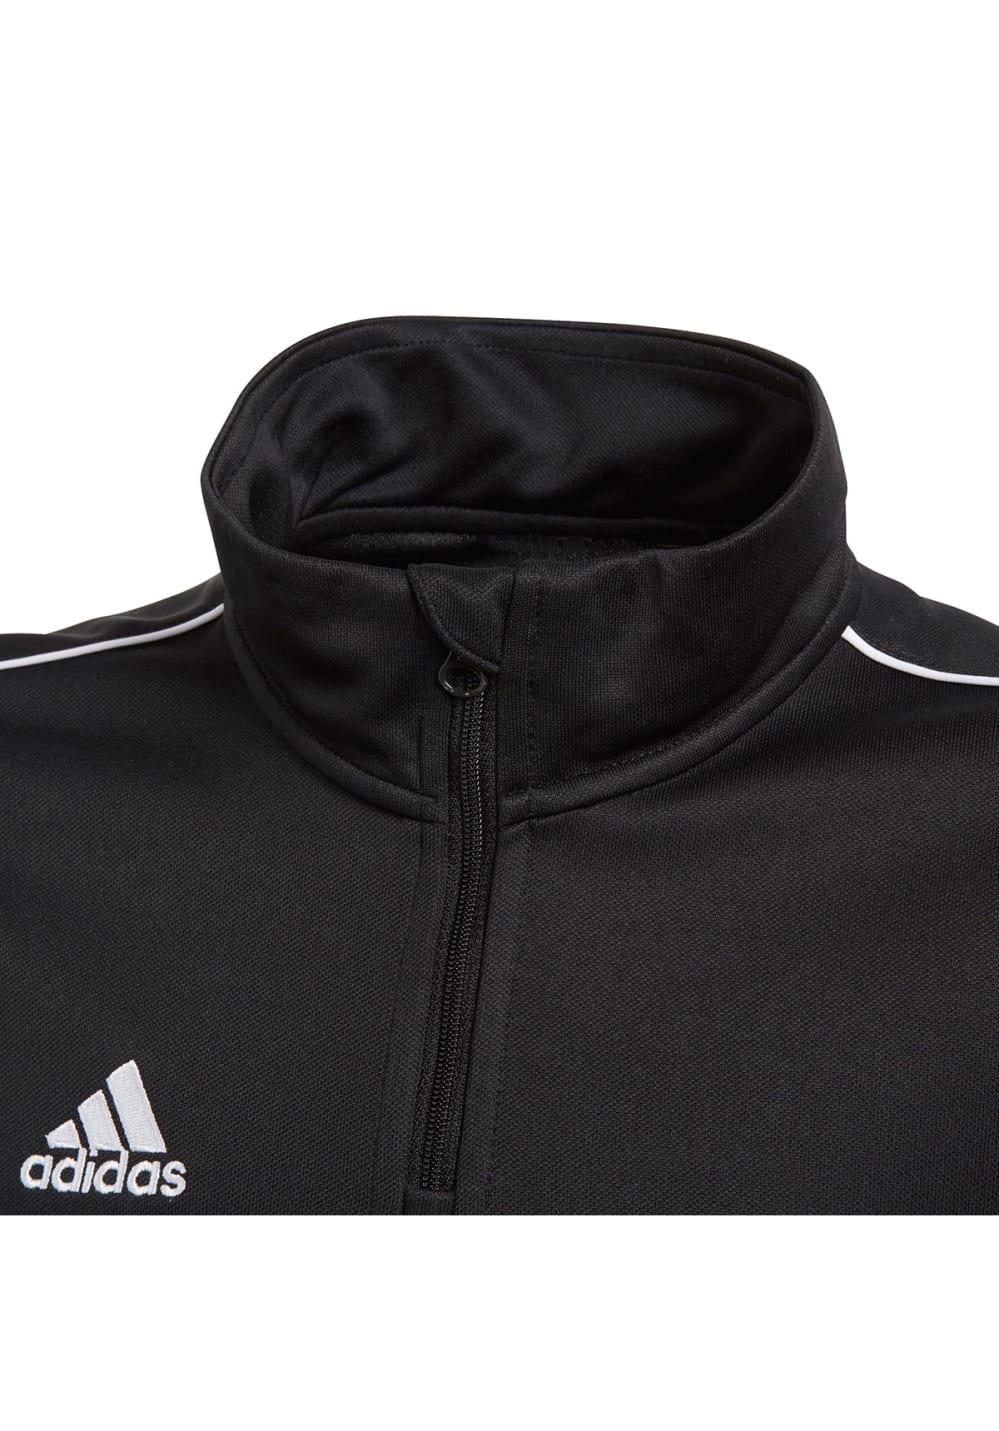 popular brand biggest discount retail prices Adidas Hoodie Kinder Schwarz | Mytoys Sale Adidas ...